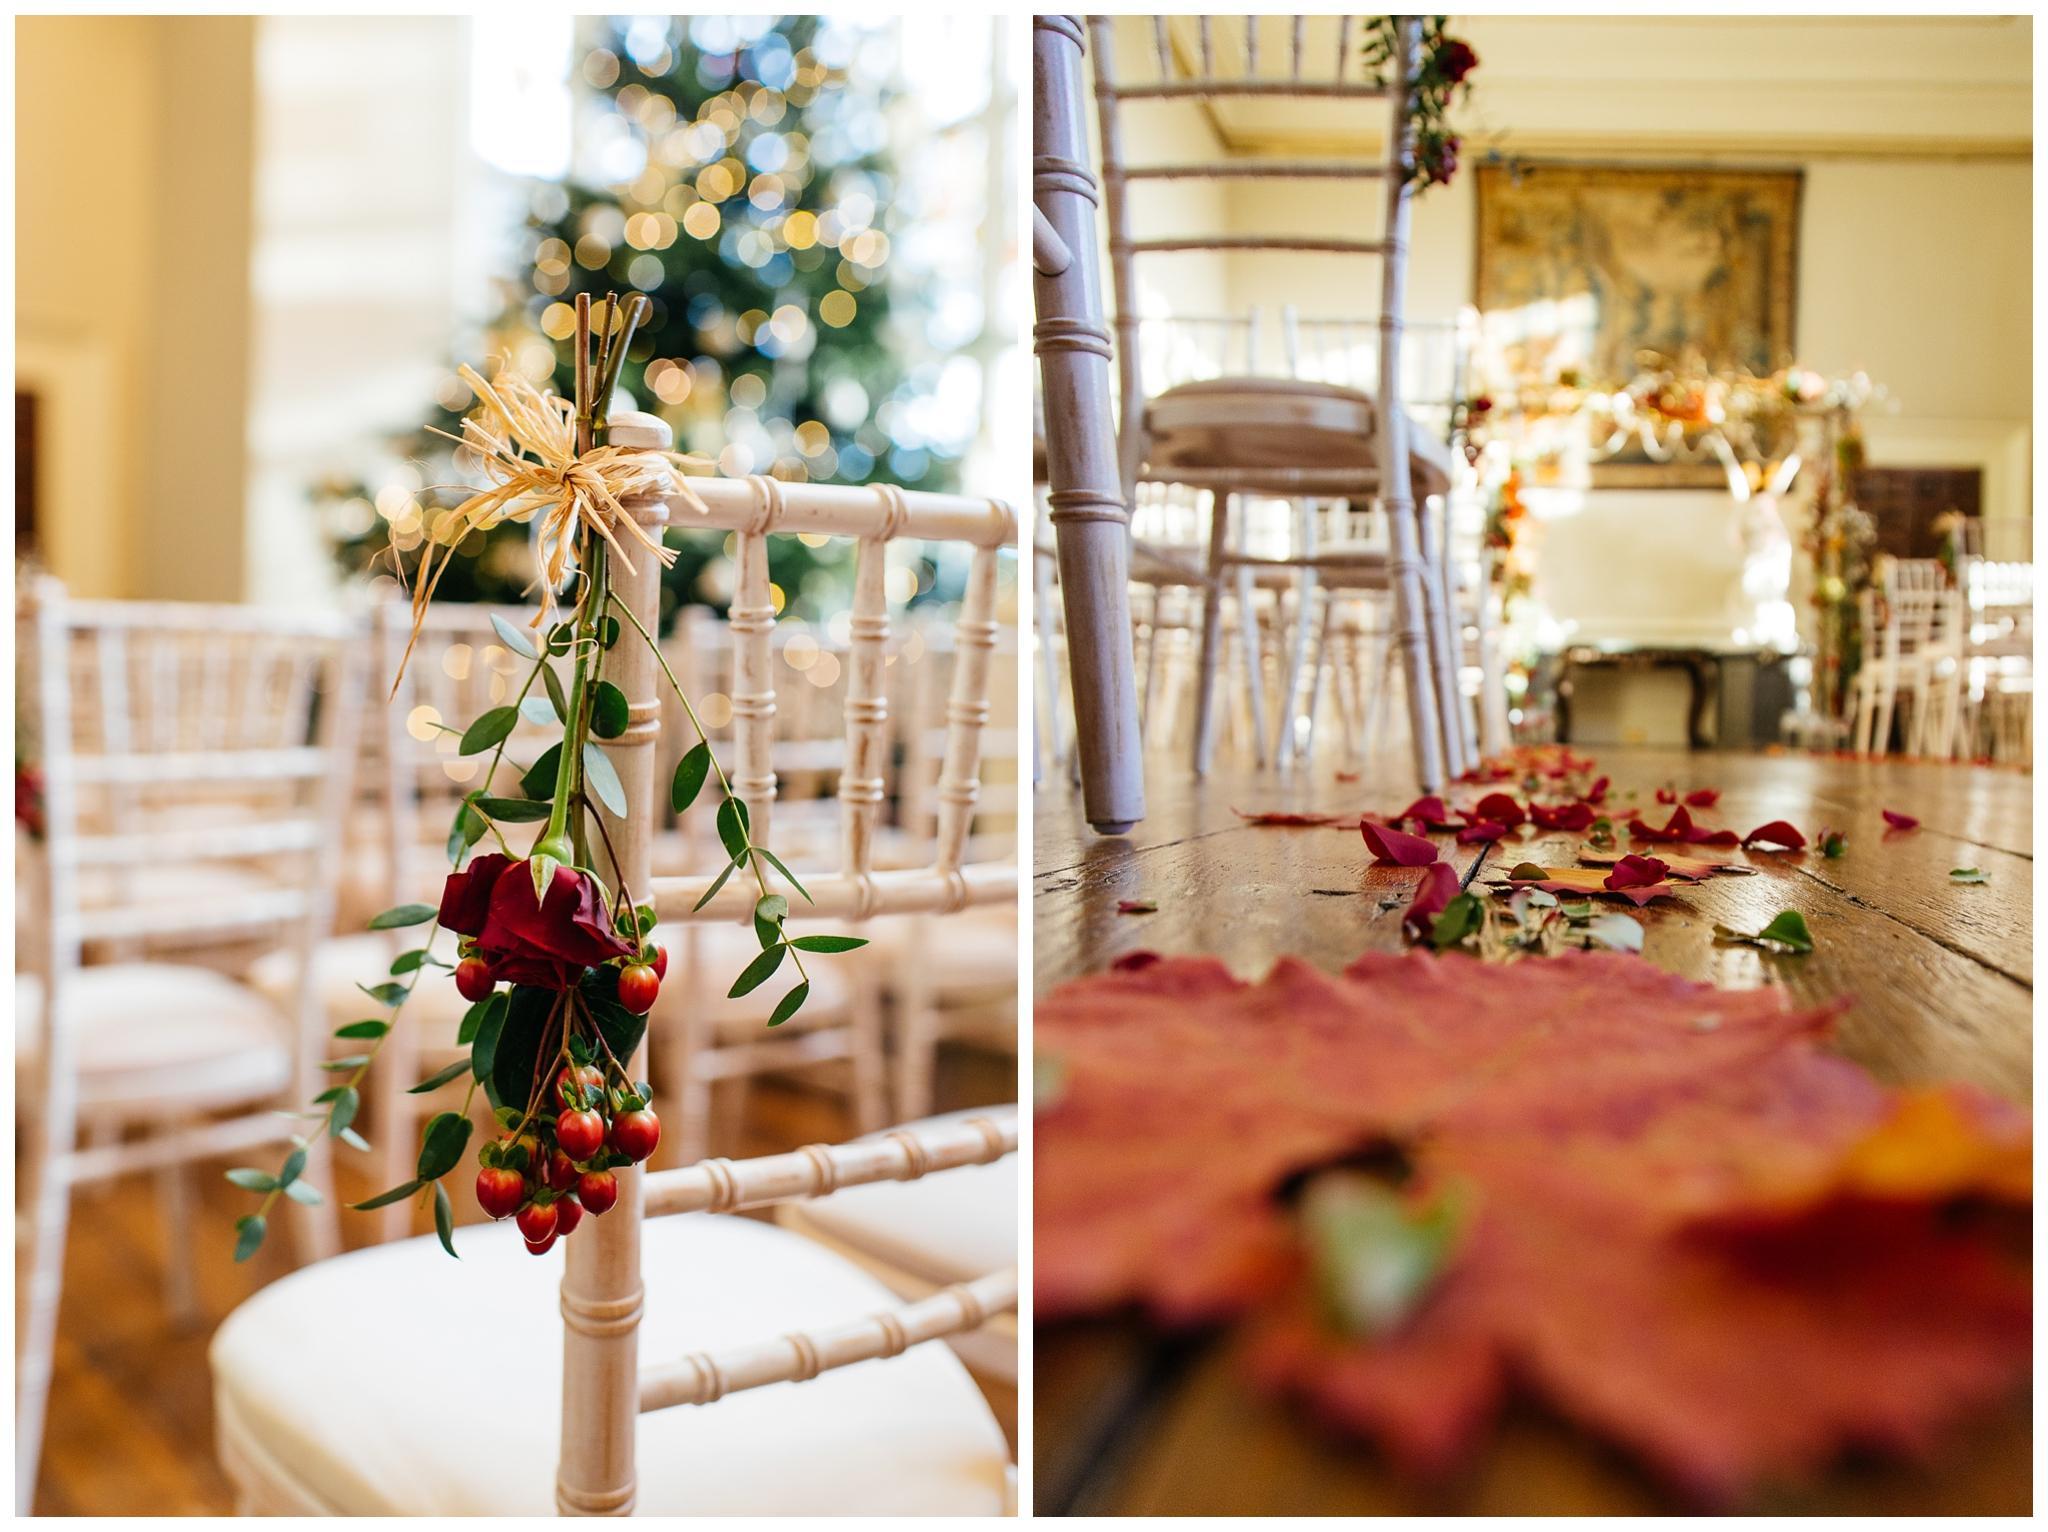 Emma&Paul-Elmore-Court-Winter-Wedding-Nikki-Cooper-Photography_0007.jpg